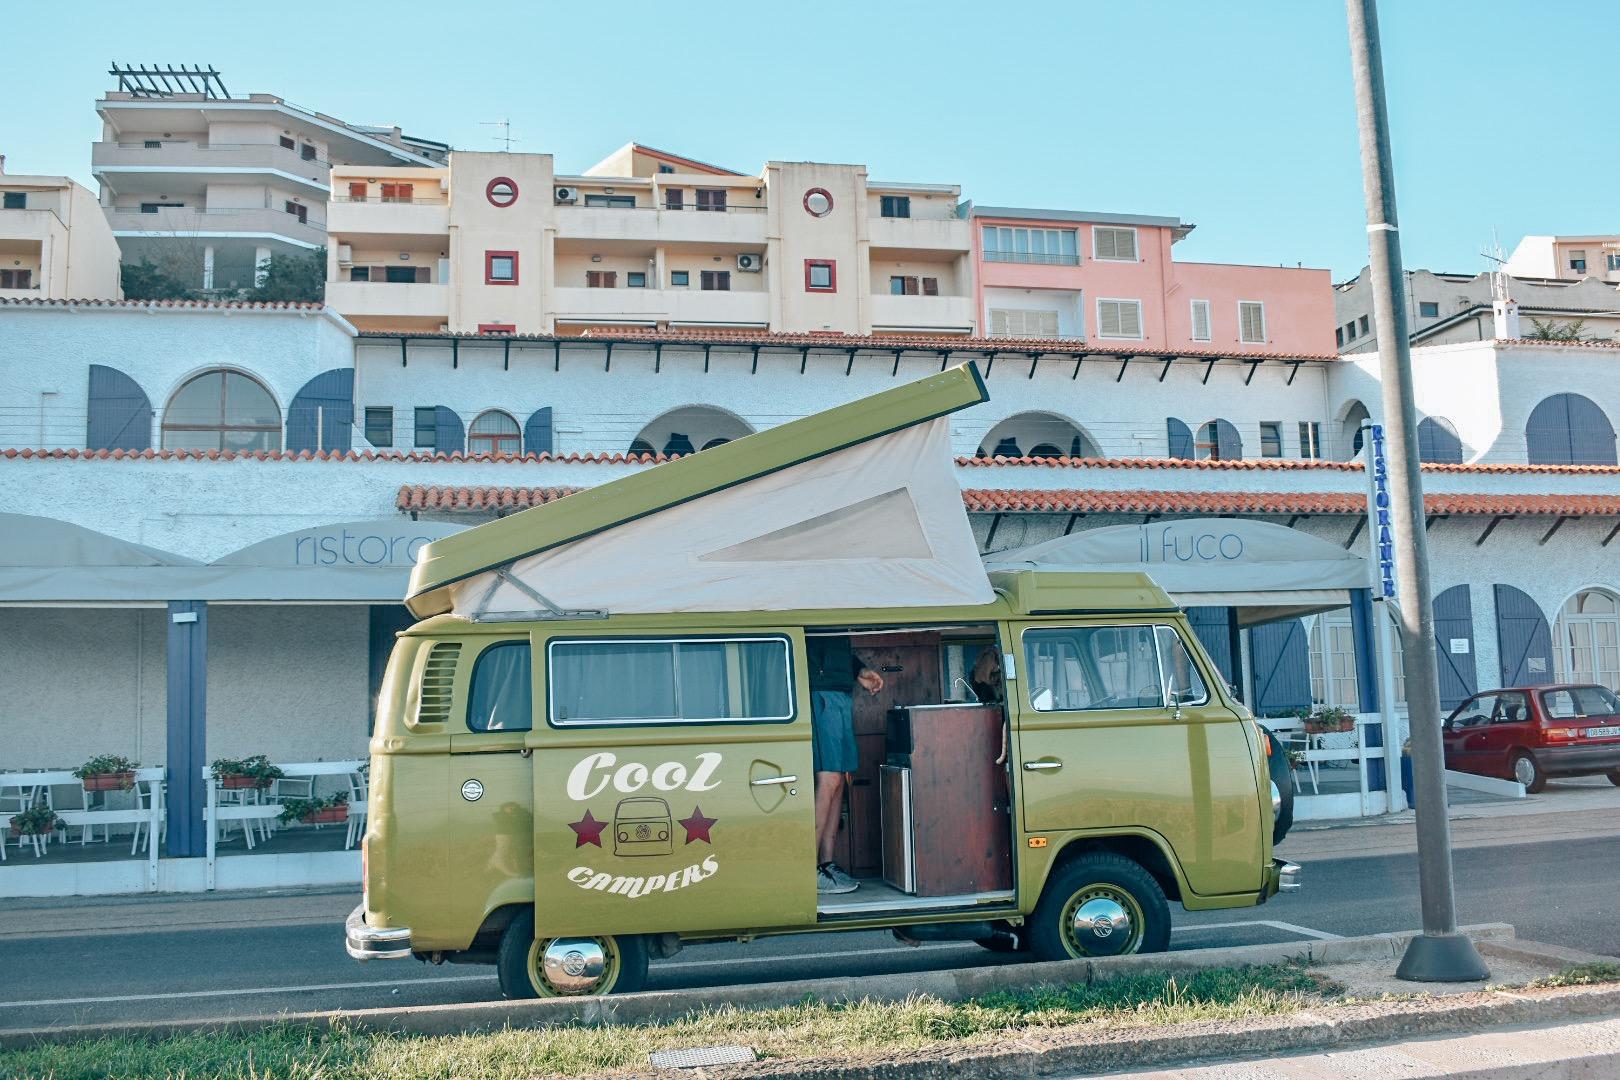 Off season camping in Sardinia